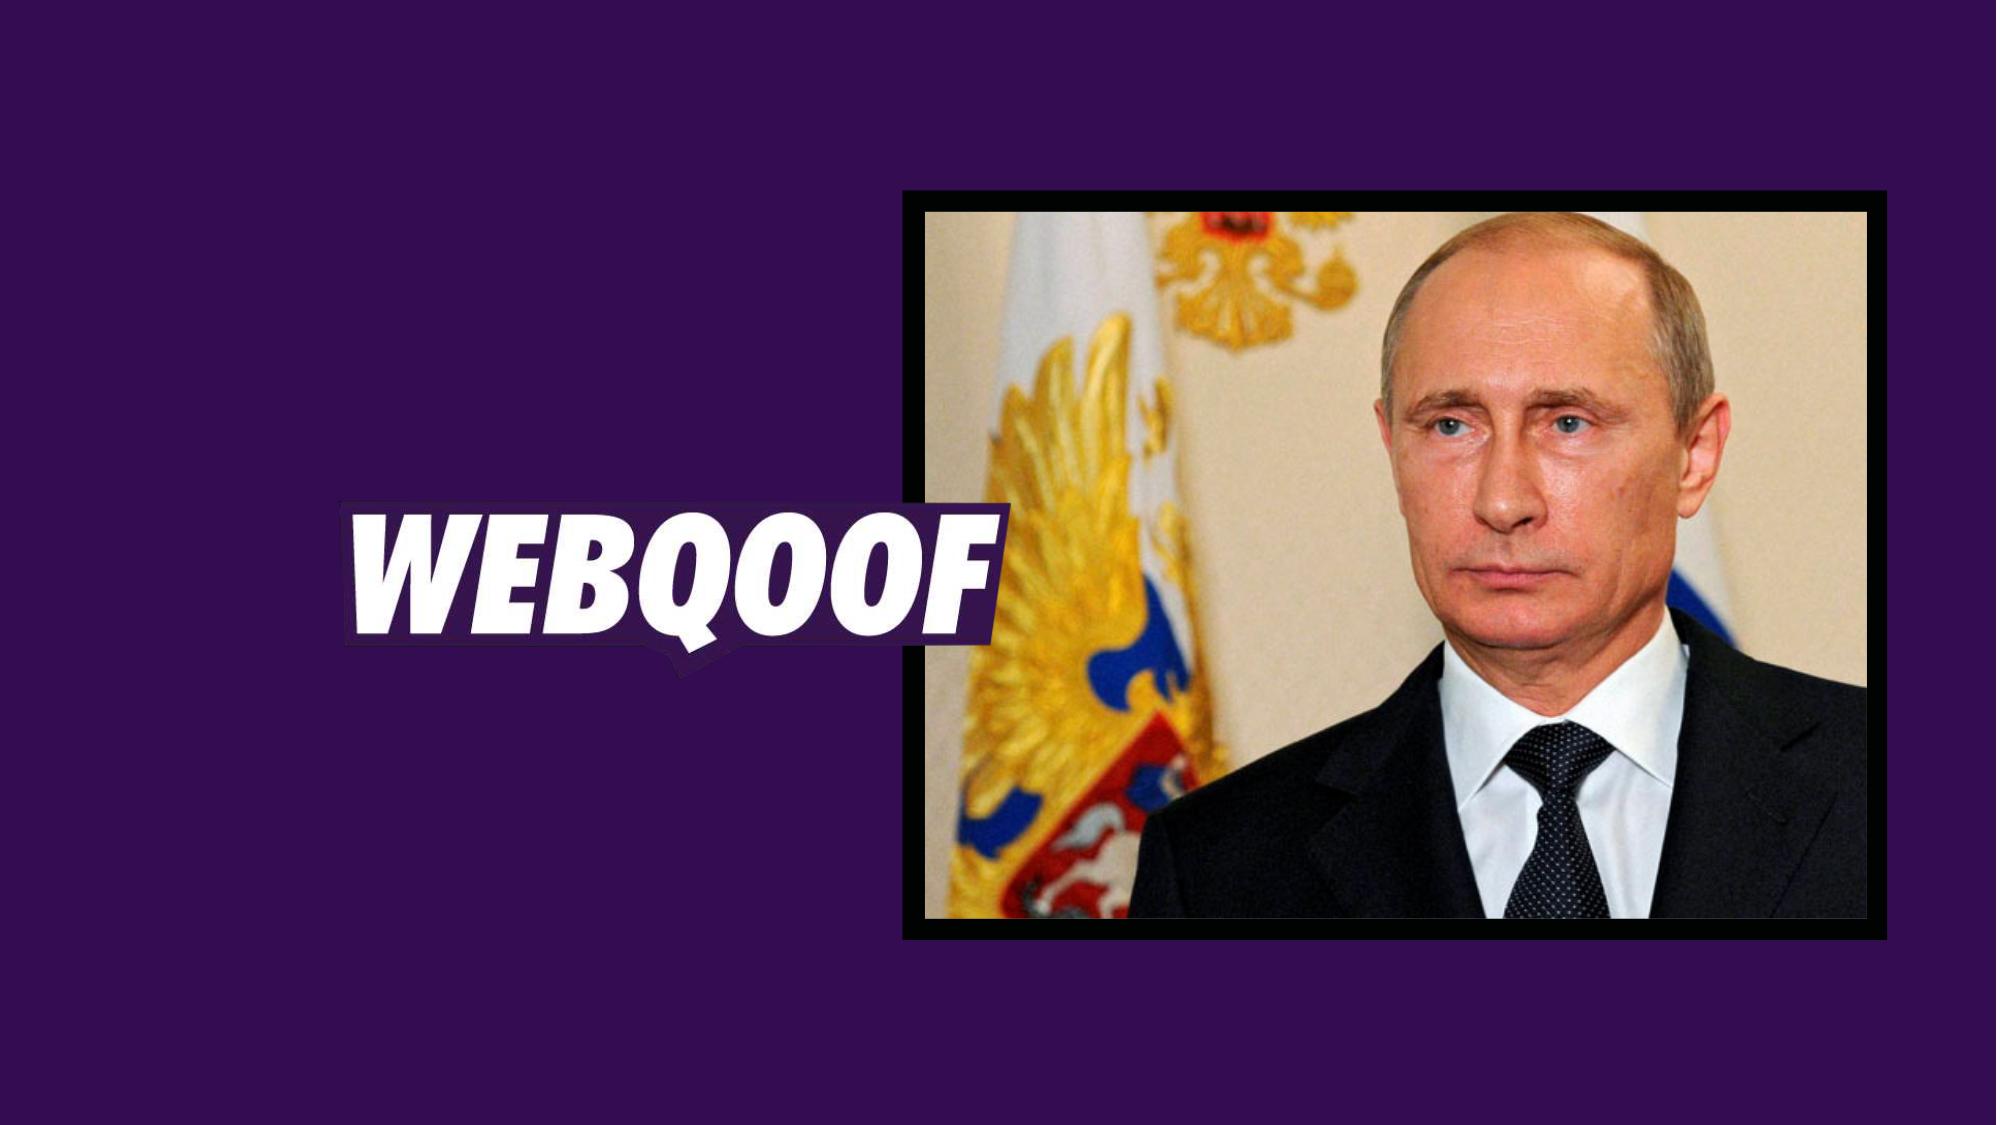 No, Vladimir Putin Didn't Deliver 'Anti-Minority Speech' in Russia